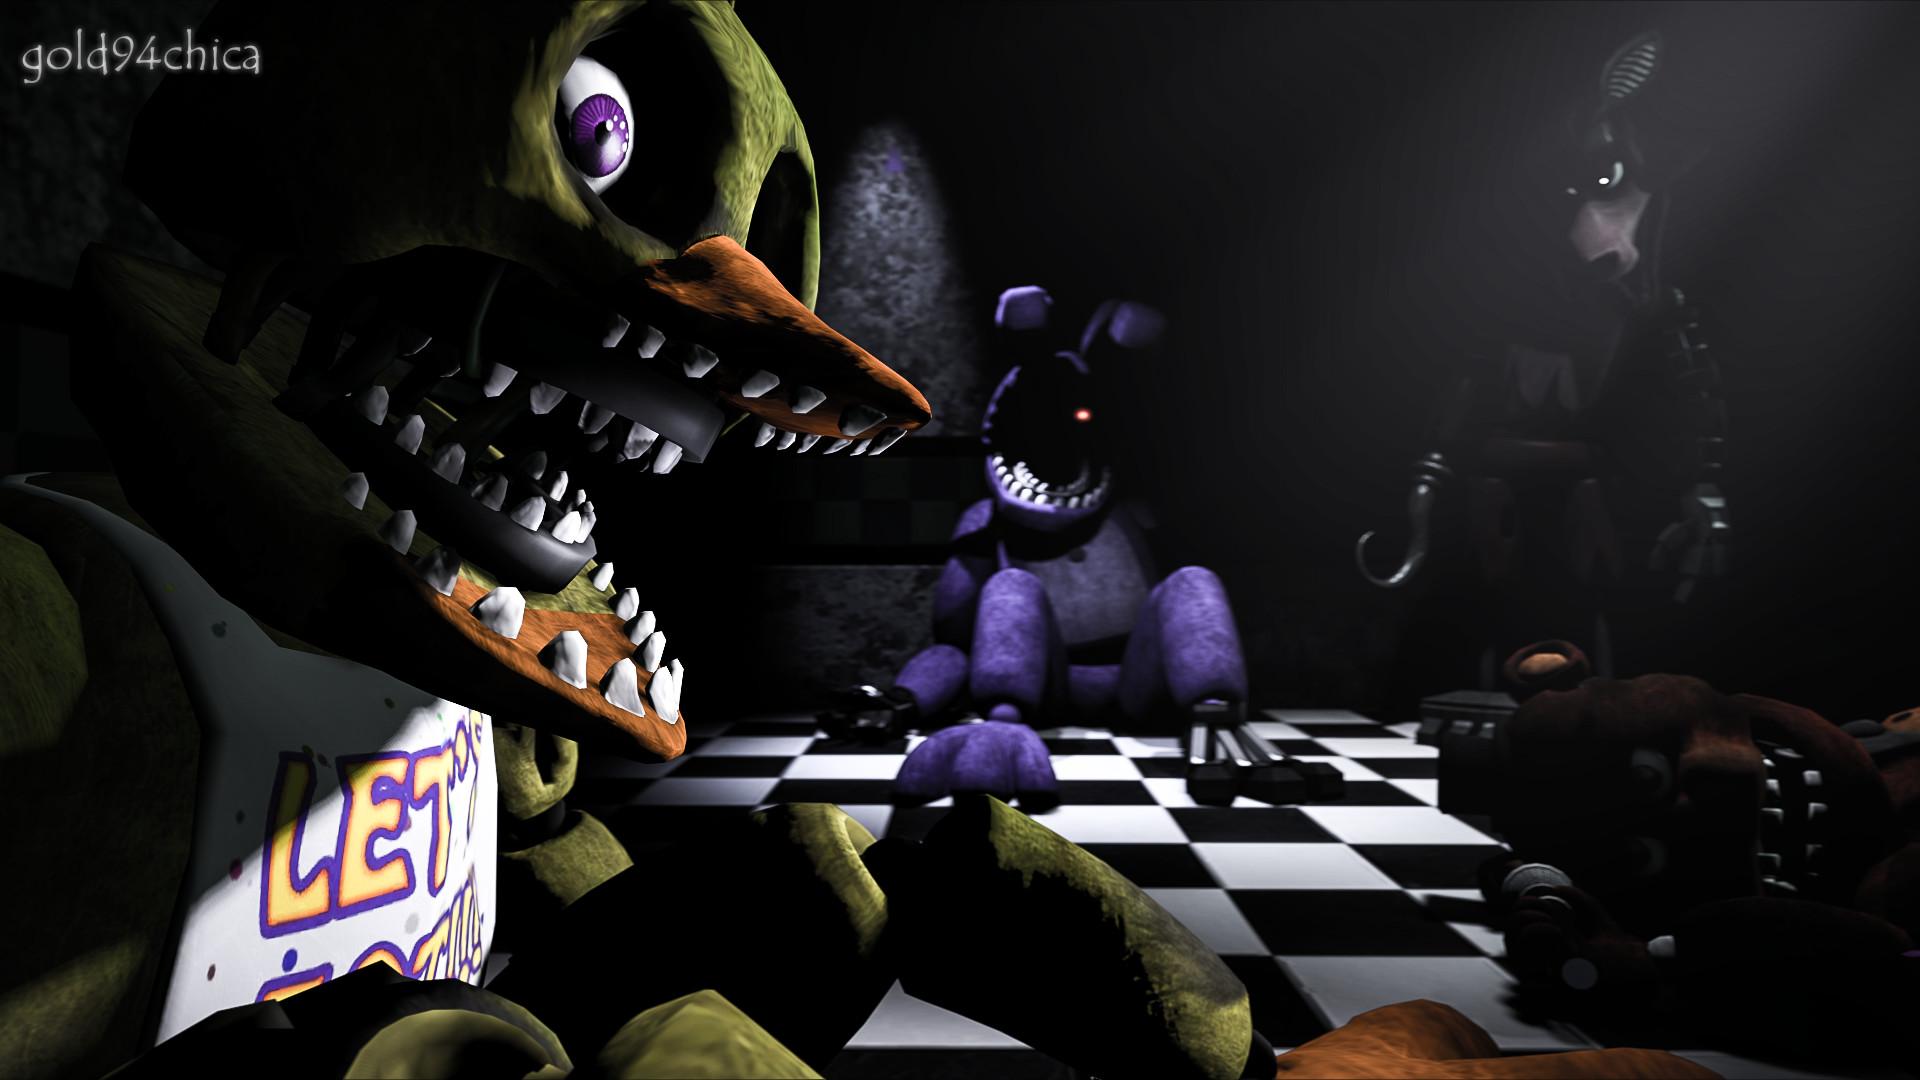 Five Nights at Freddy's wallpaper dump